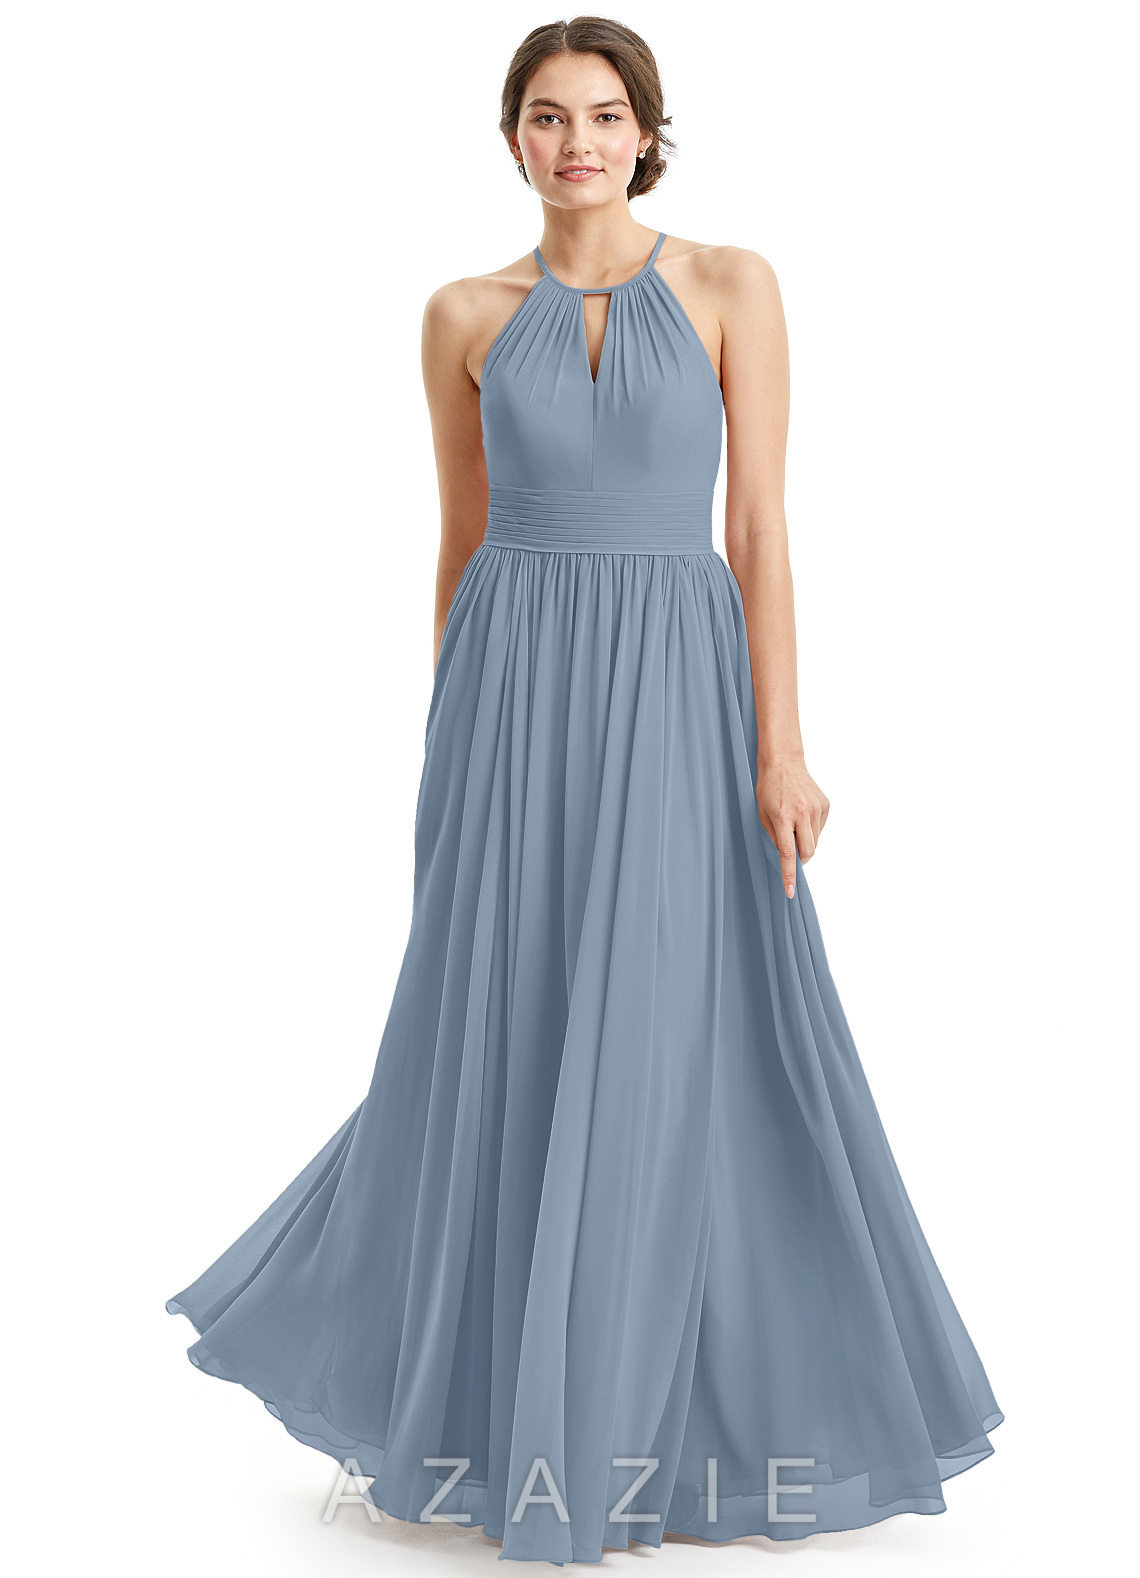 5de32211698 Azazie Cherish Bridesmaid Dress - Dusty Blue